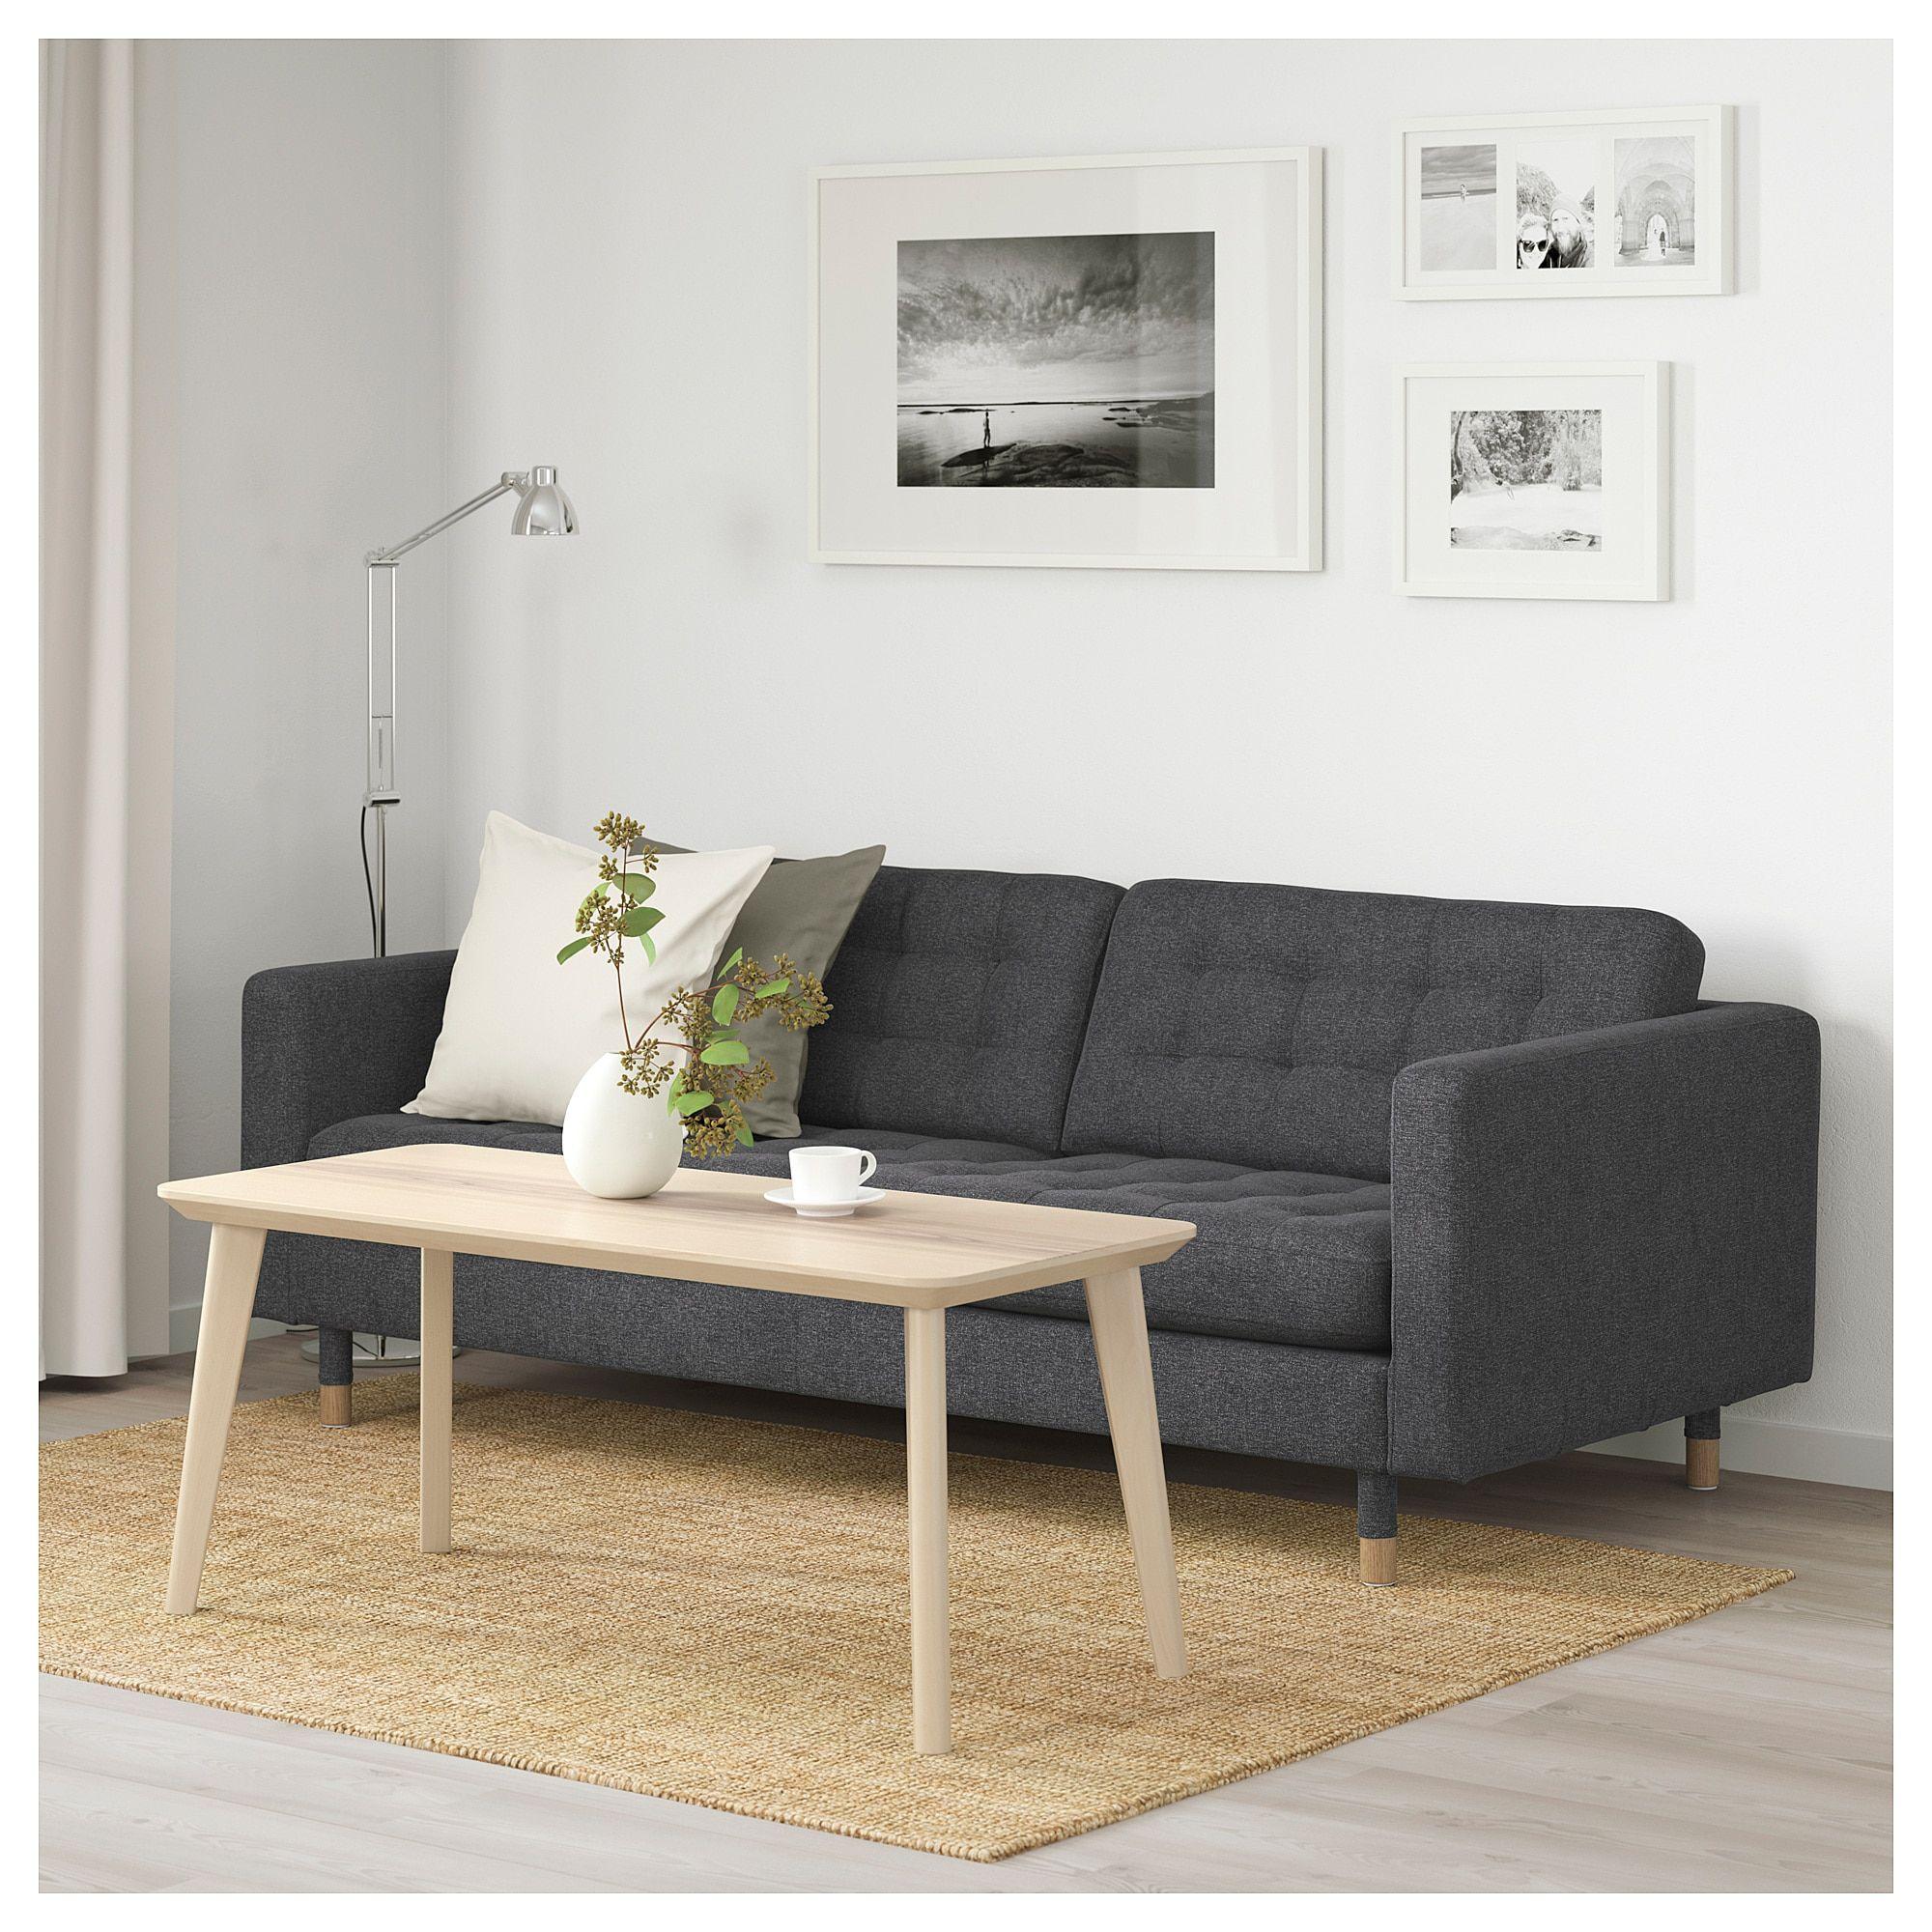 Us Furniture And Home Furnishings Landskrona Sofa Fabric Sofa